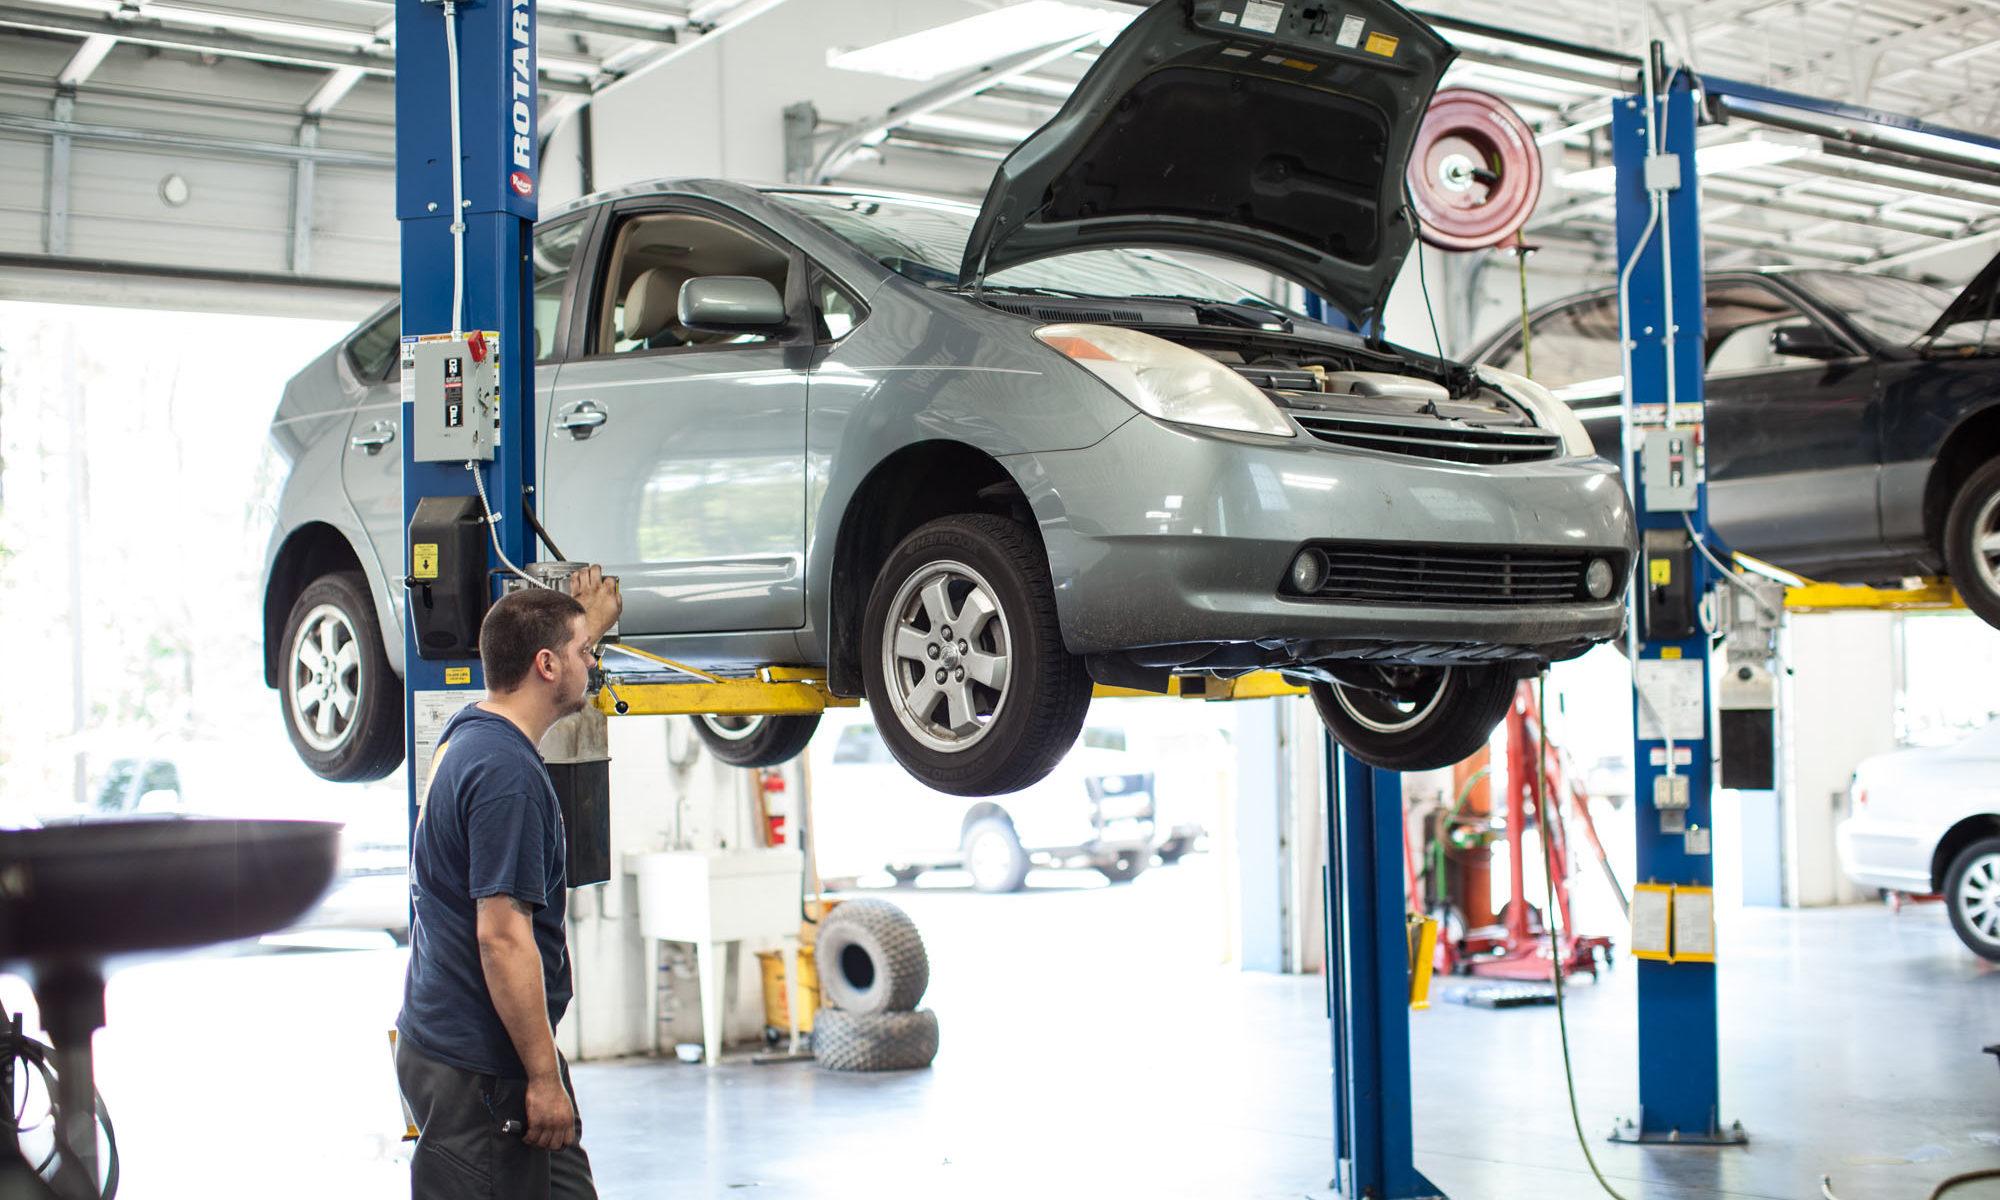 hybrid car on shop lift